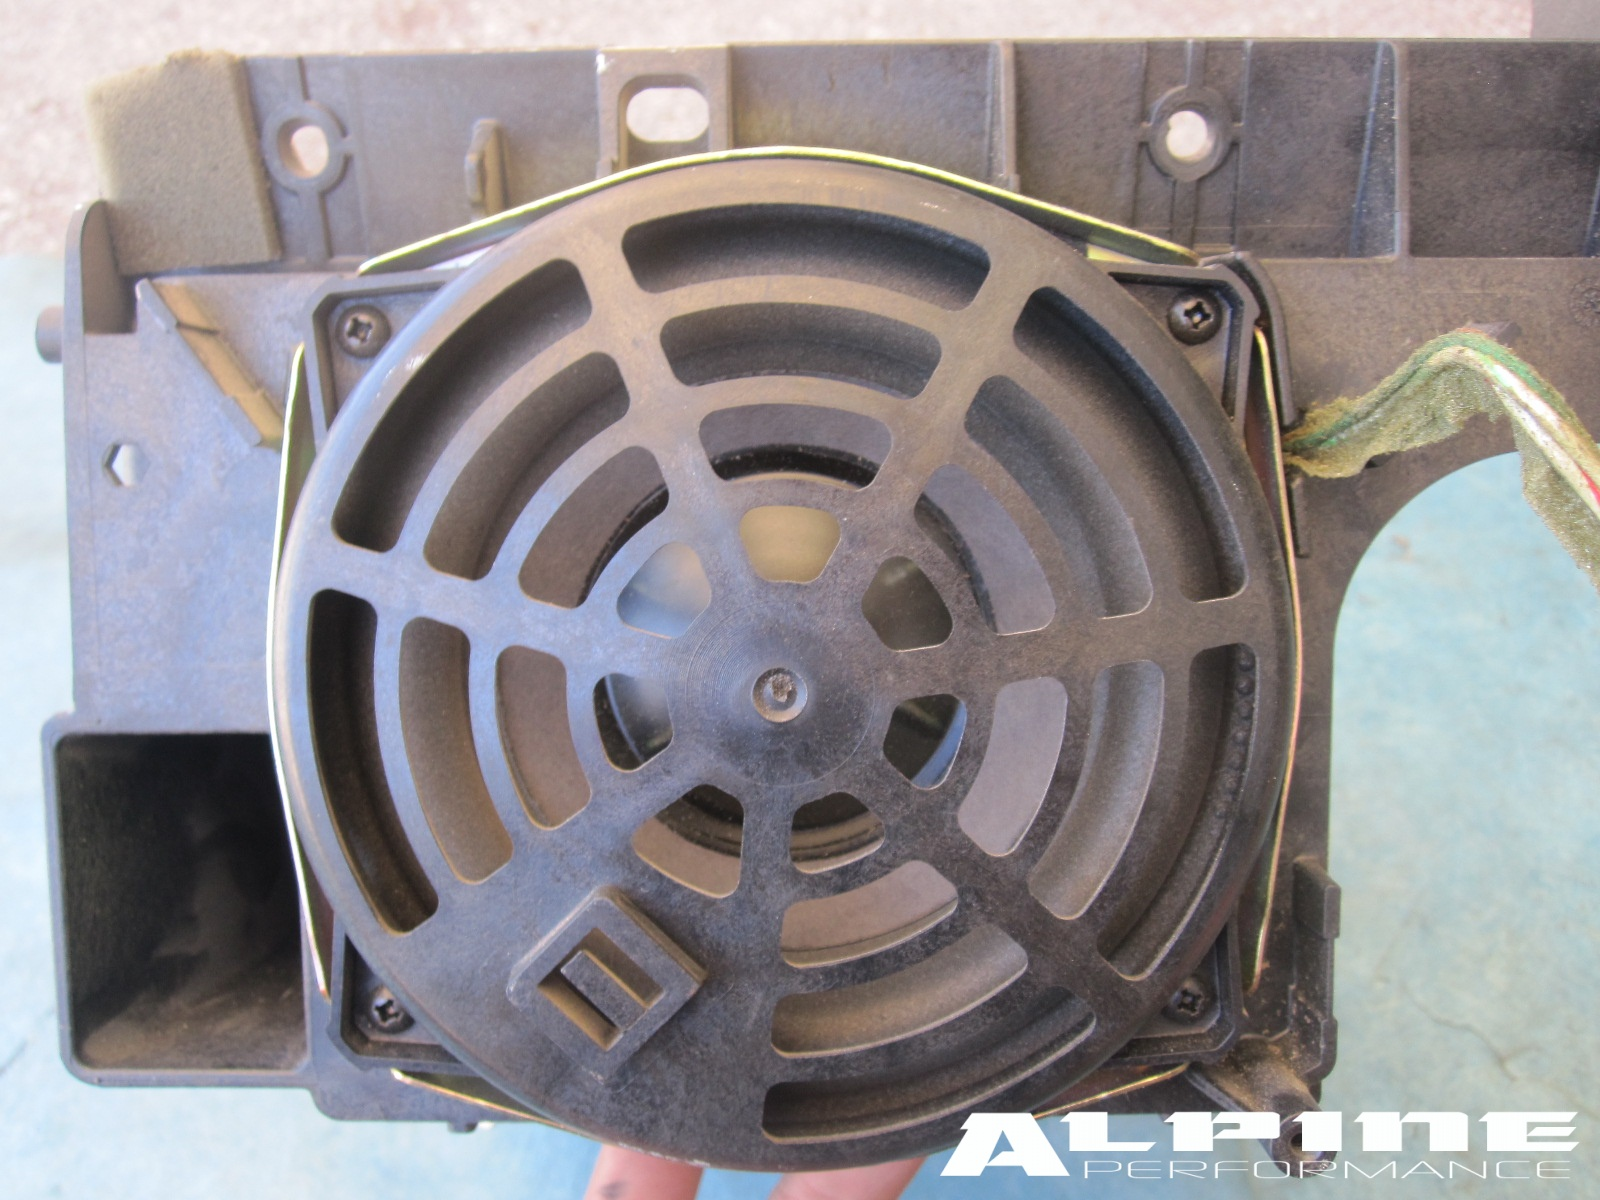 Toyota Parts Store >> Origianal GMC Yukon Denali Chevy Silverado Tahoe Sierra Center Console Factory Bose Subwoofer ...